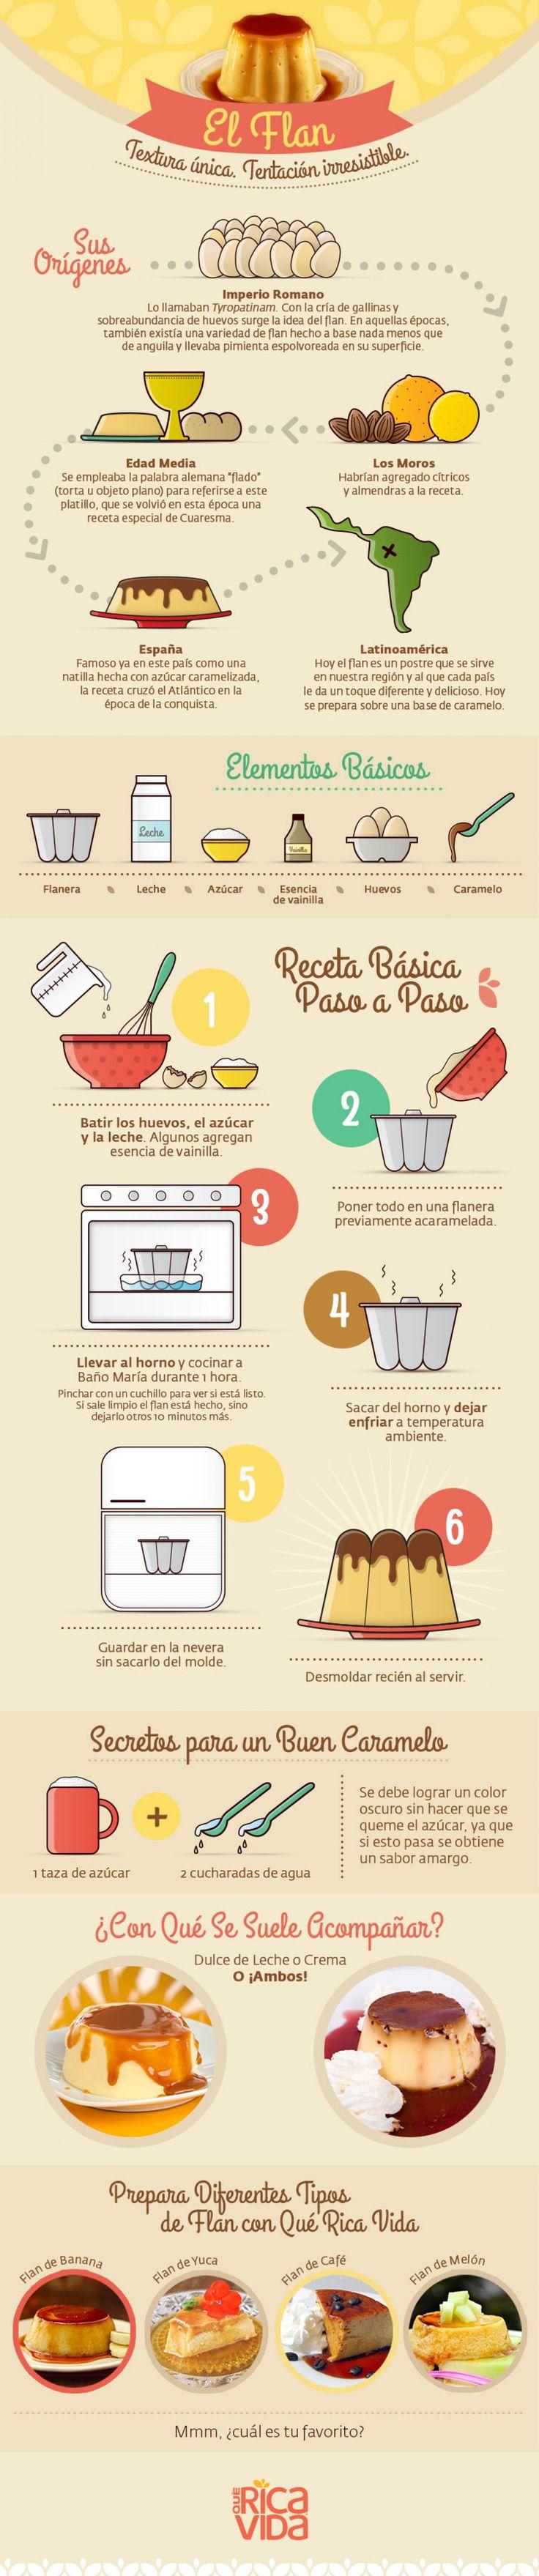 Historia del flan y recetas https://www.pinterest.com/jacquesoger/cocinarecetas-alimentostapas-aperitivosy-m%C3%A1s/